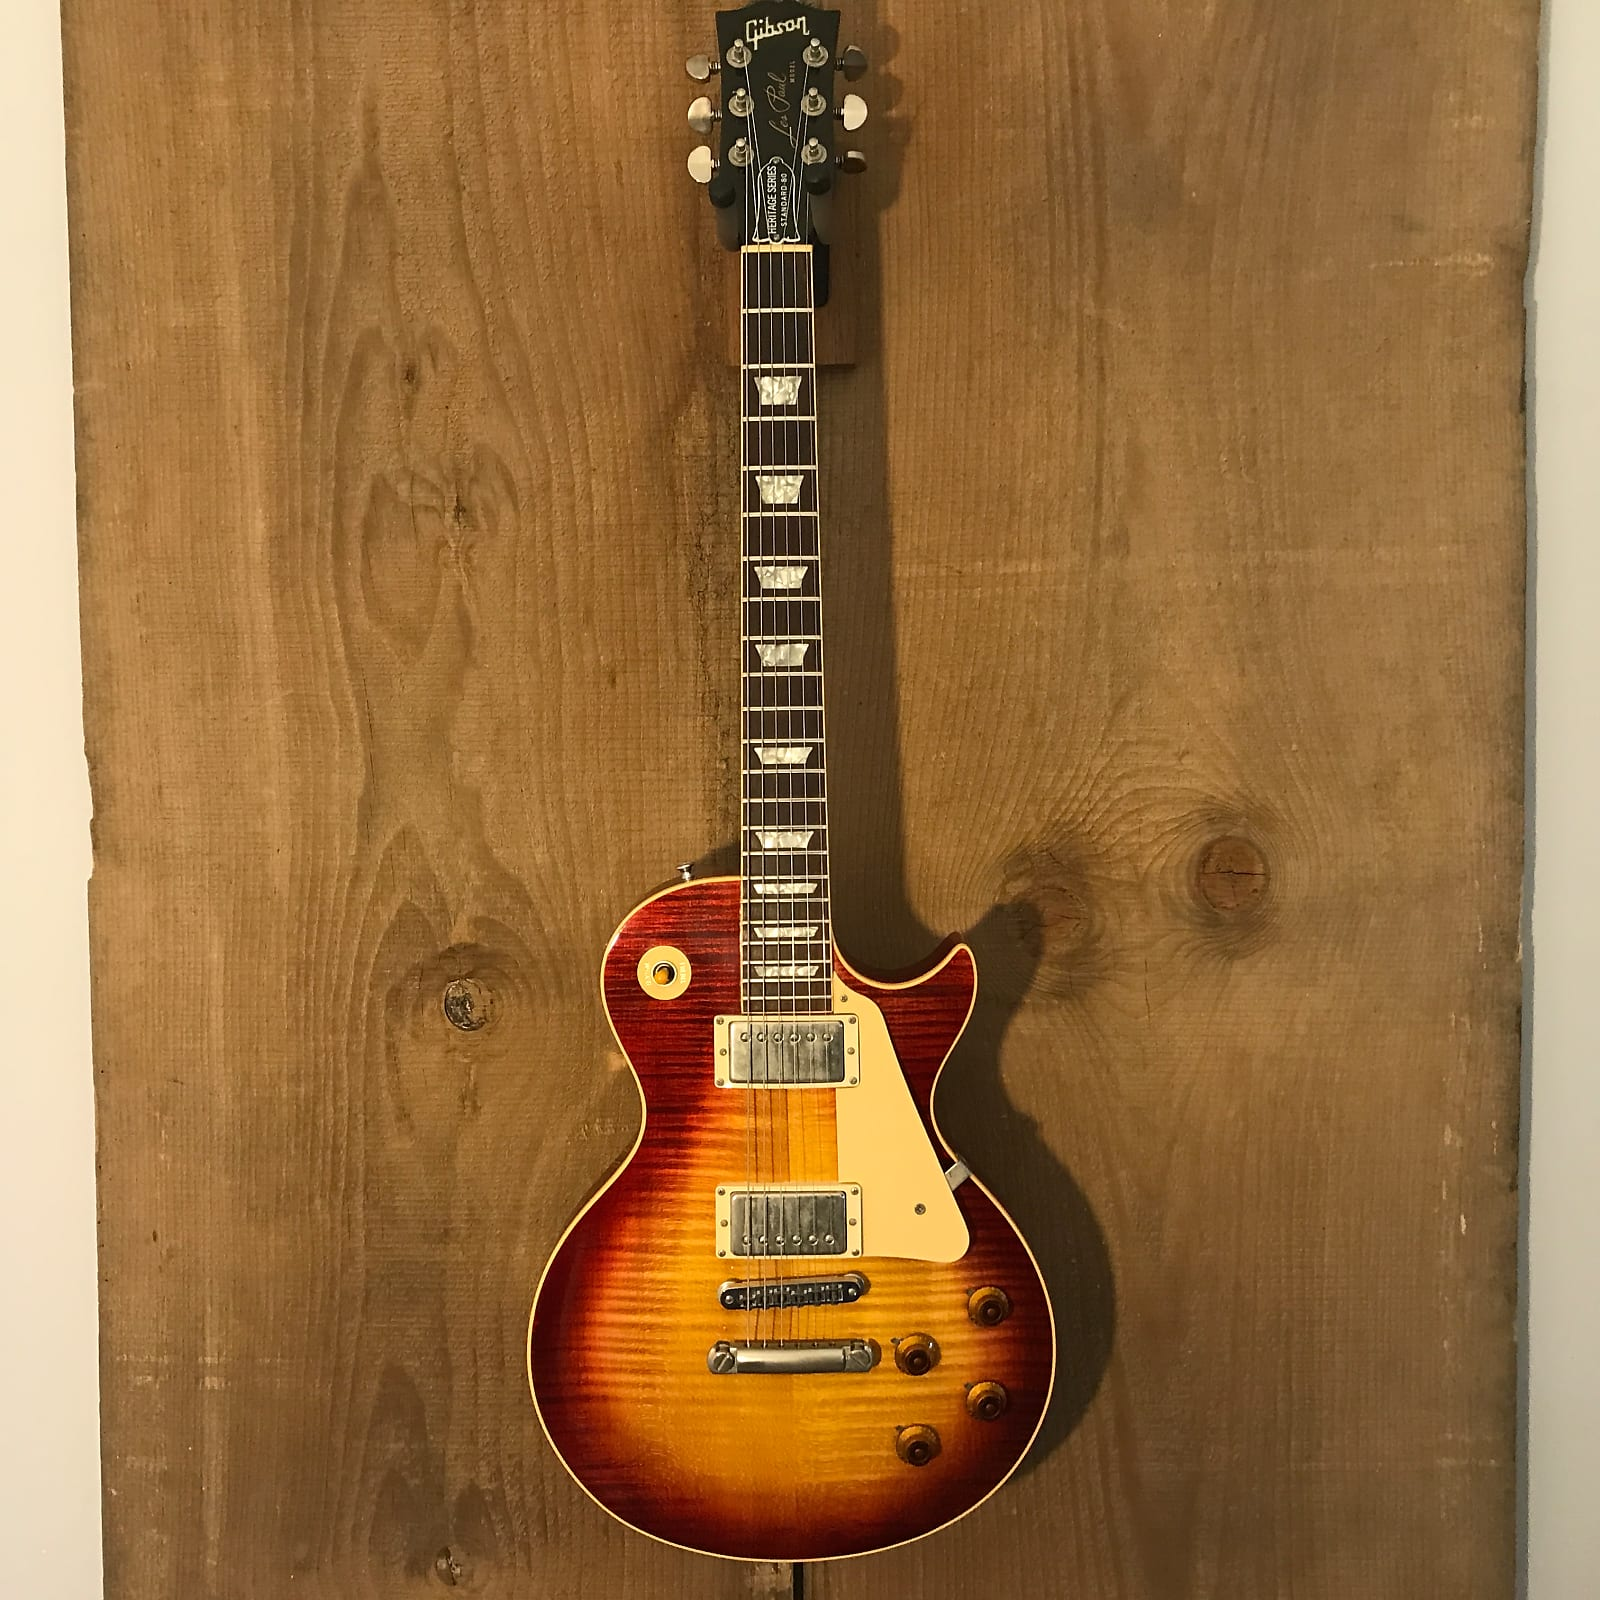 Gibson Les Paul Heritage Series Standard-80 Historic Sunburst 1981 #1939 w/ OHSC